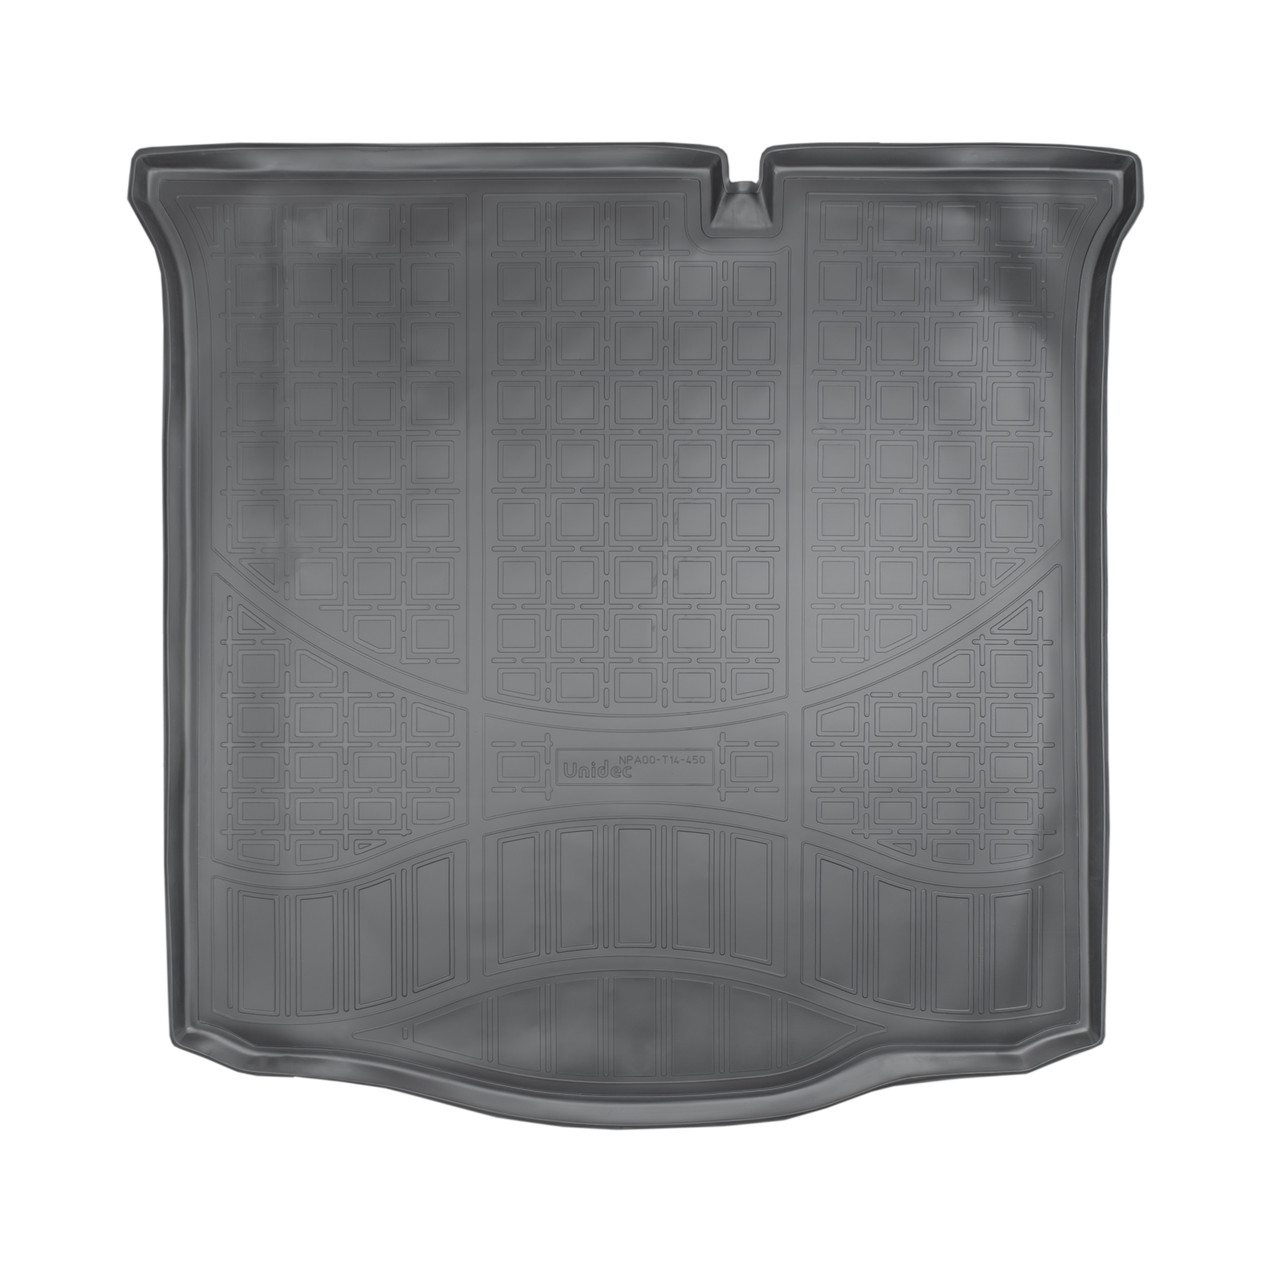 Коврик в багажник Peugeot 301 SD (2012)\ Citroen C-Elysee (D) SD (2012)